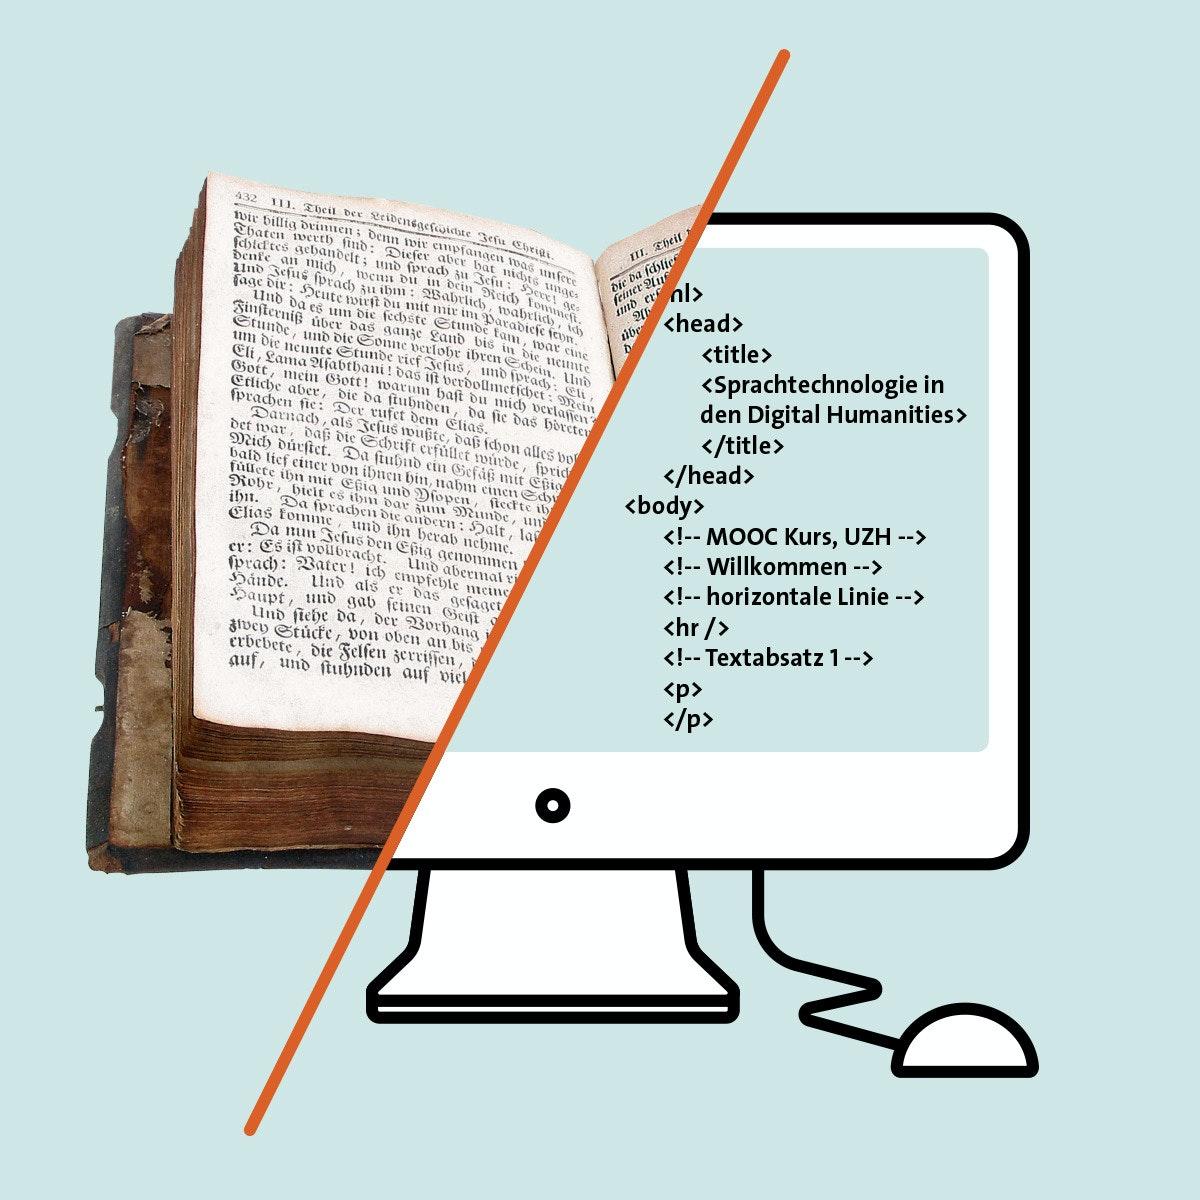 Sprachtechnologie in den Digital Humanities